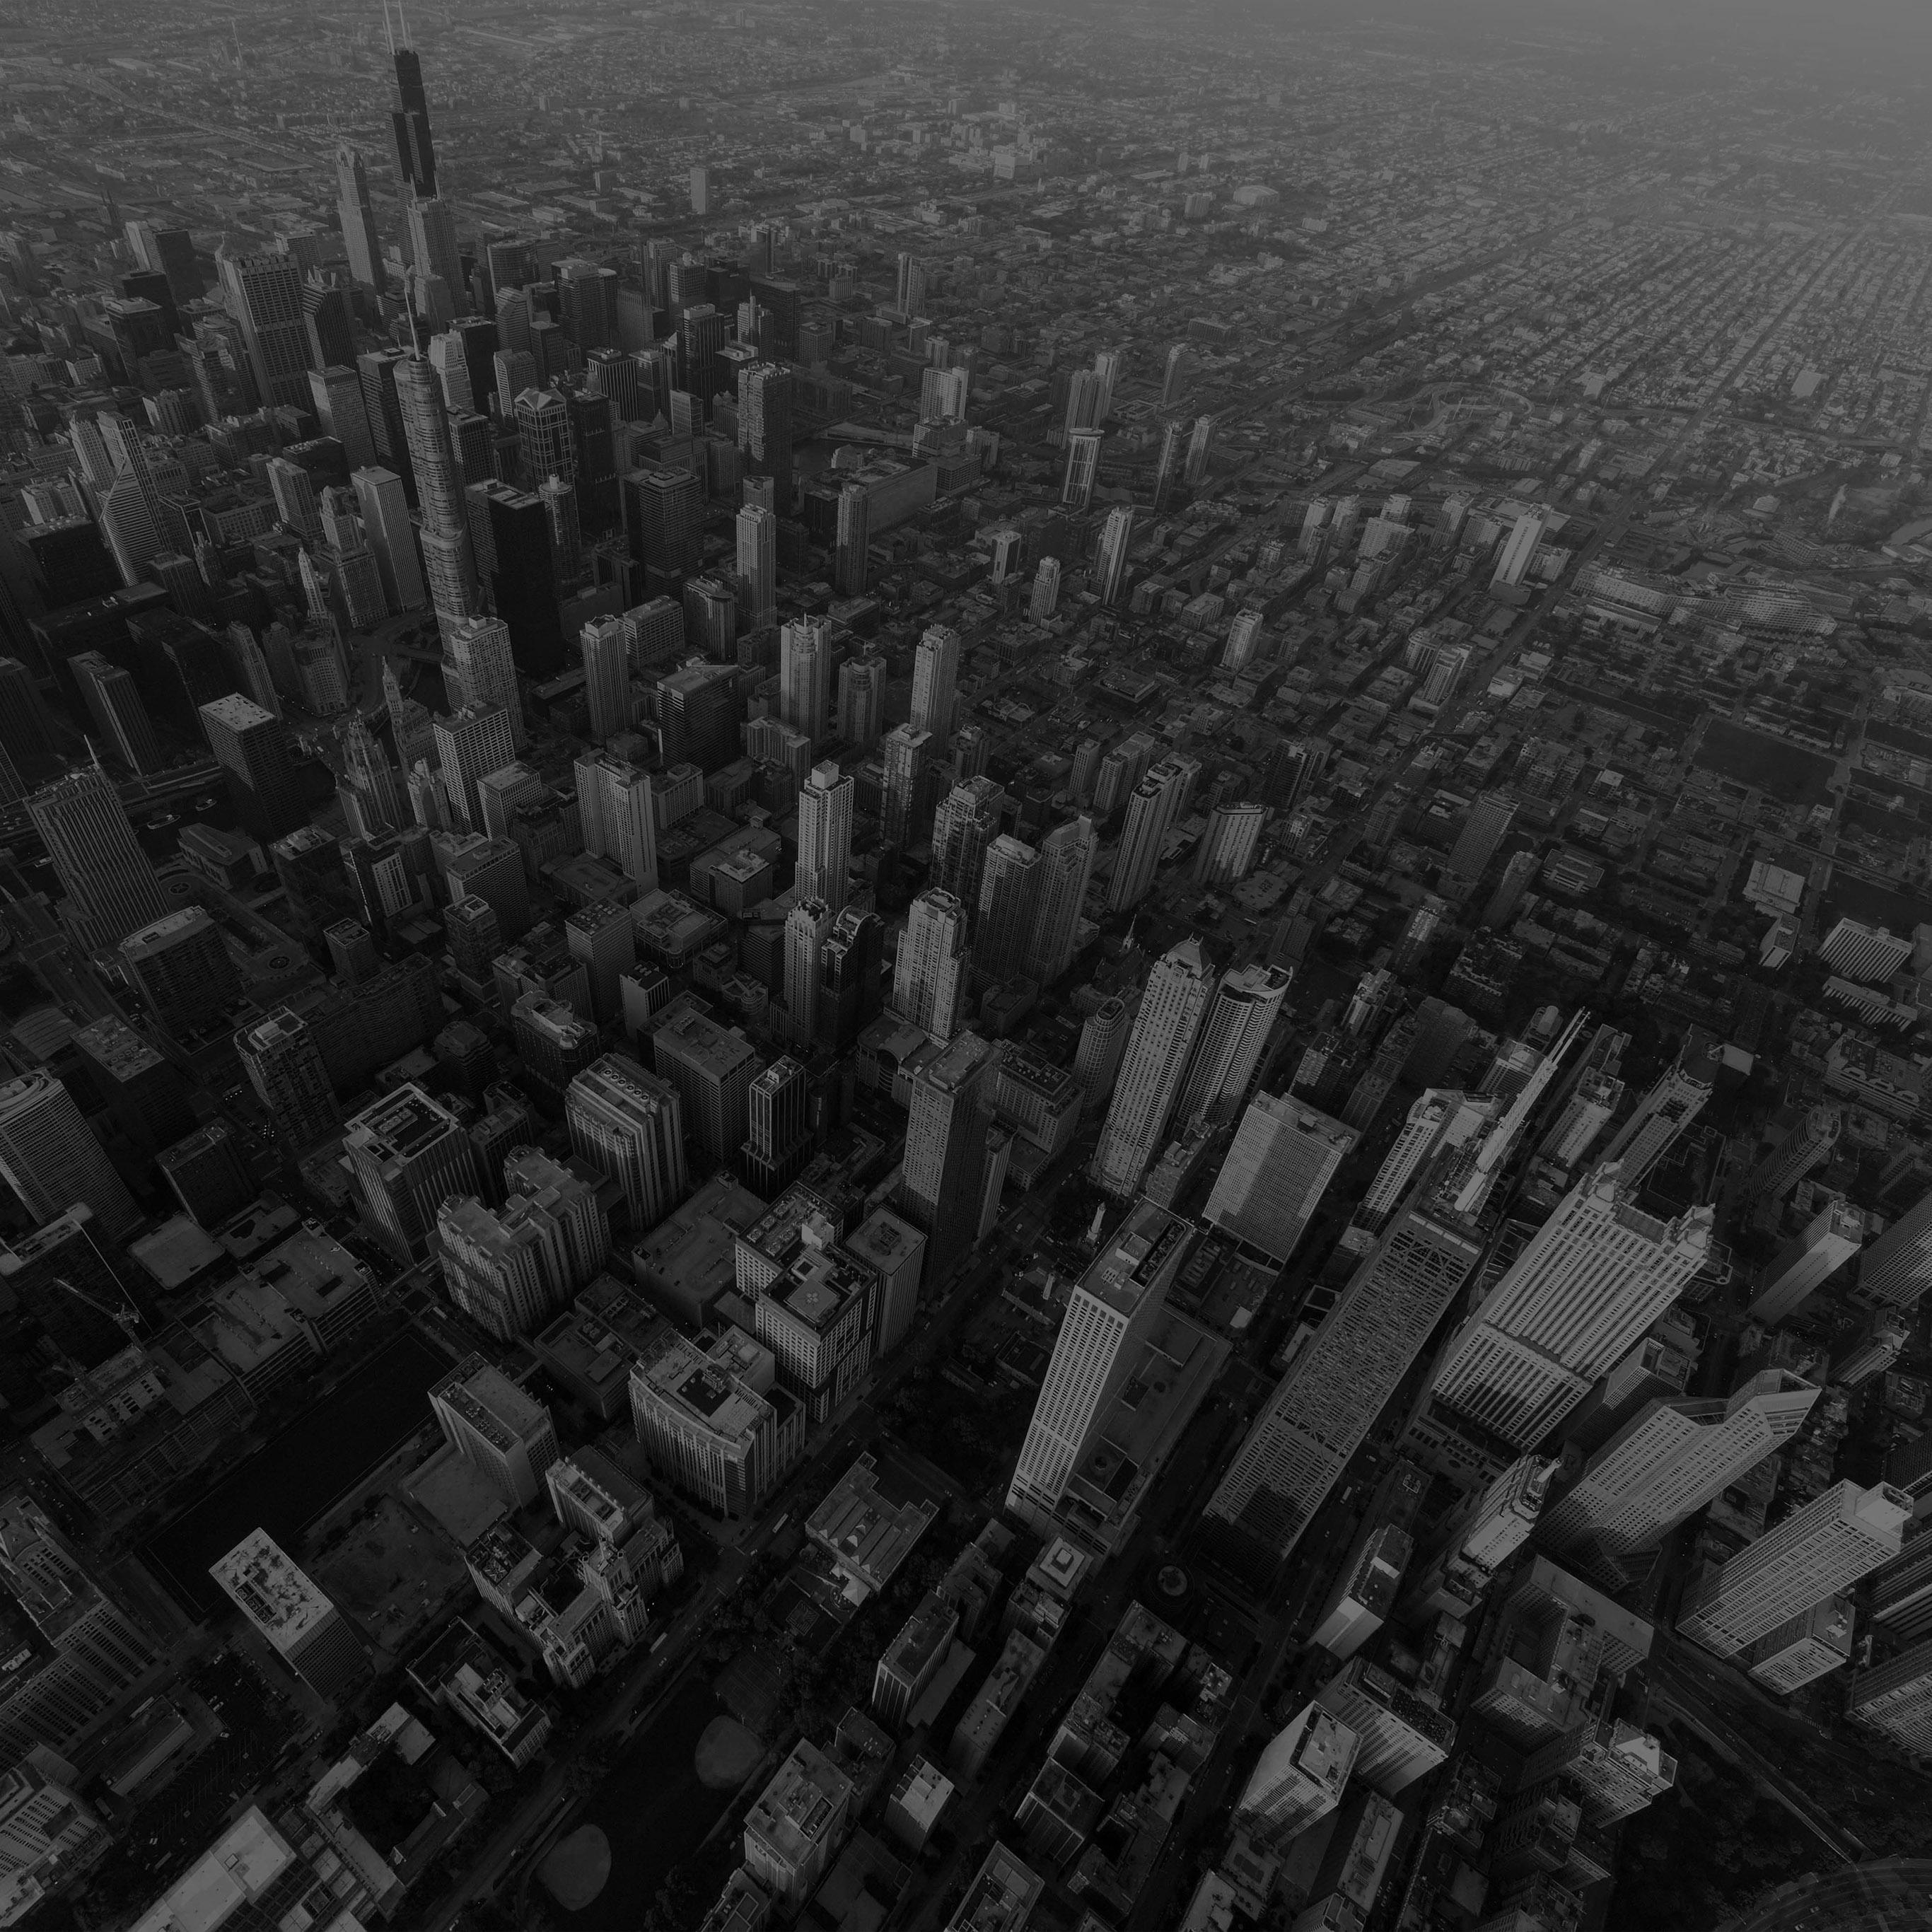 Na57 Chicago City Skyview Building Architecture Blocks Dark Bw